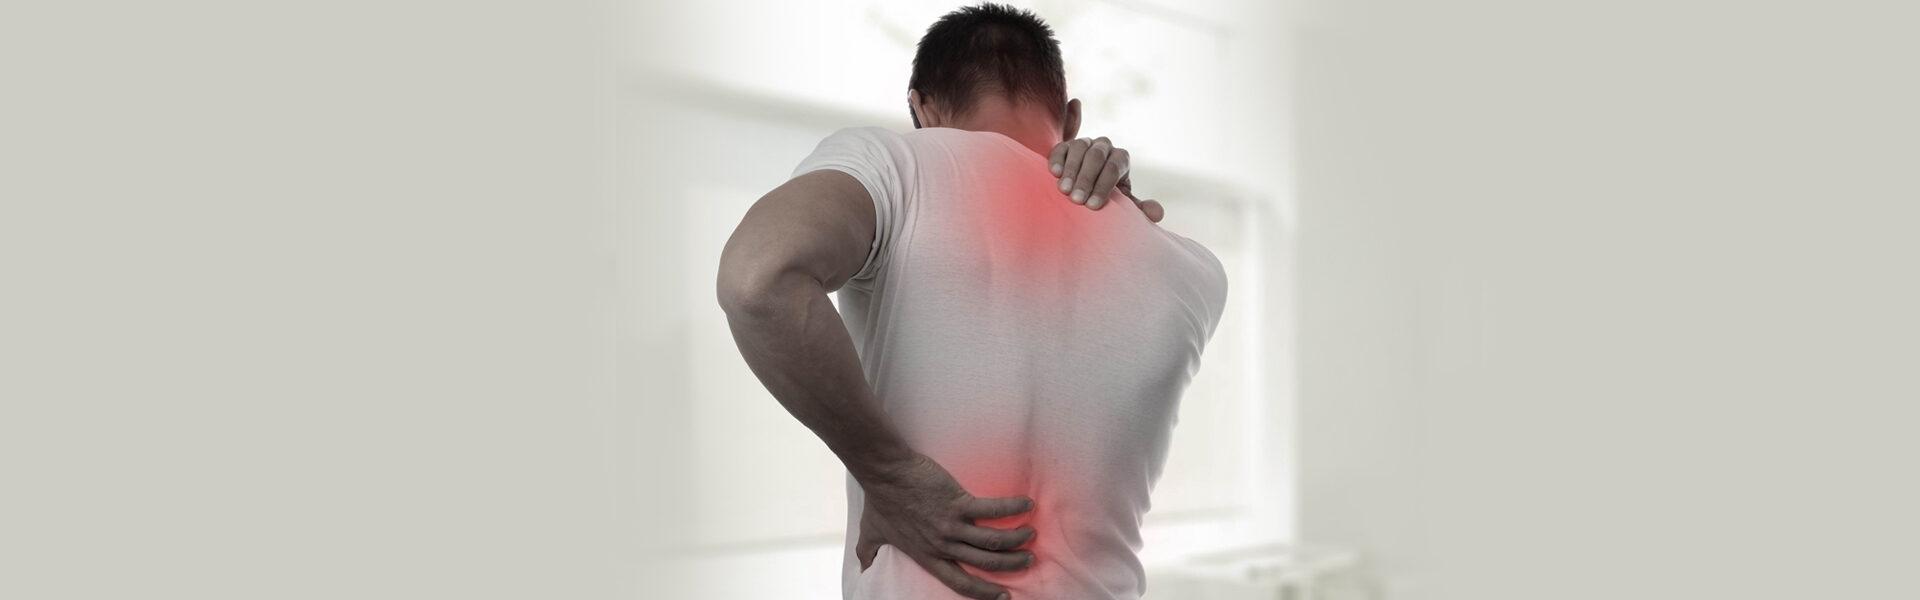 Neck Pain with Headache Treatment in Traverse City, MI